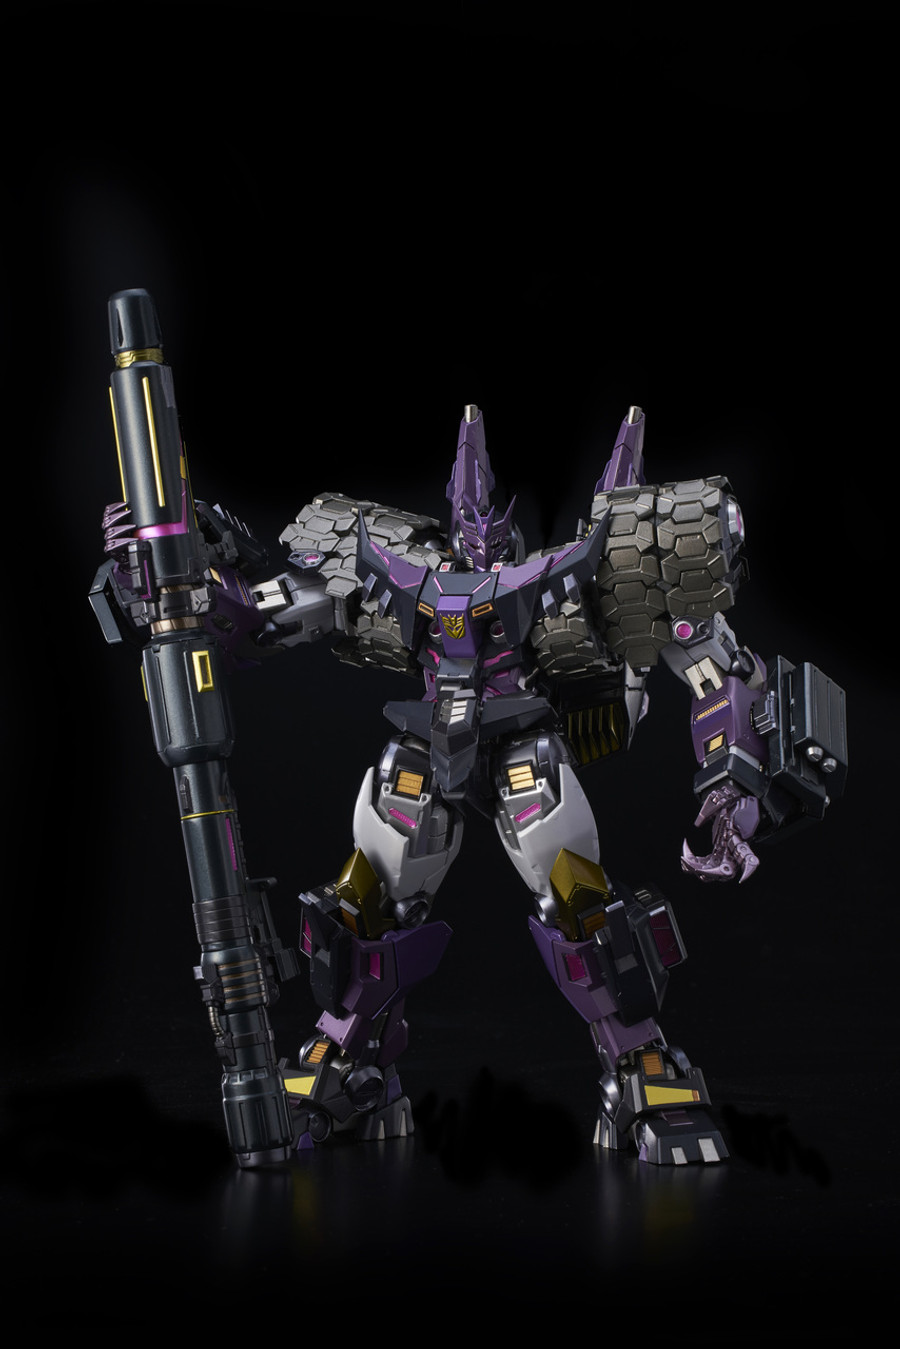 Flame Toys - Transformers Tarn (Reissue)